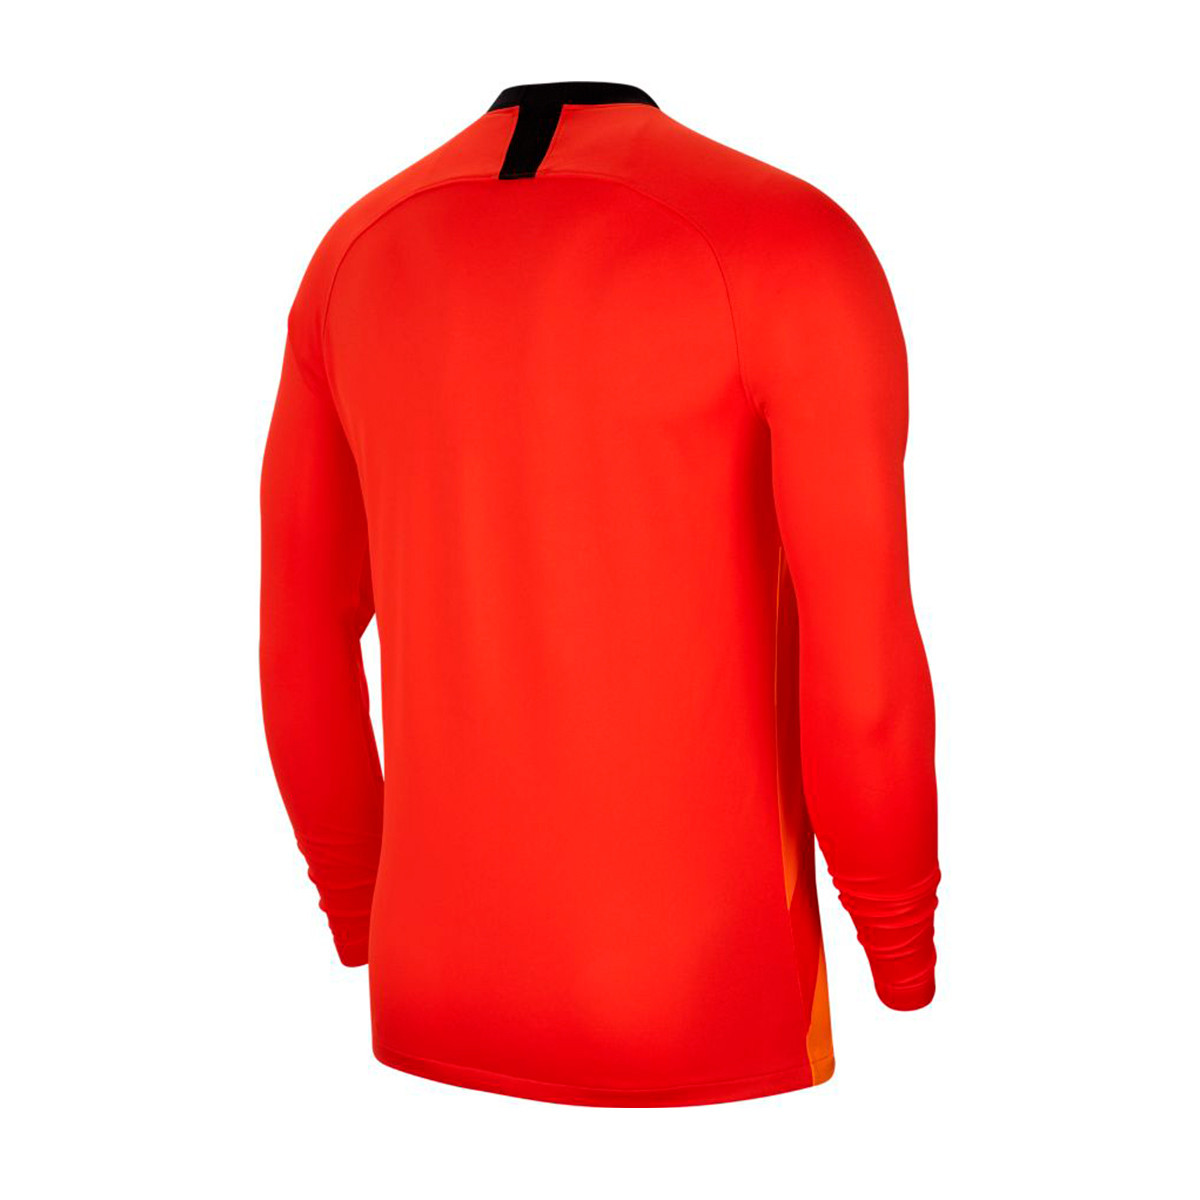 Jersey Nike Tottenham Hotspur Breathe Stadium Goalkeeper 2019 2020 Team Orange Black Football Store Futbol Emotion